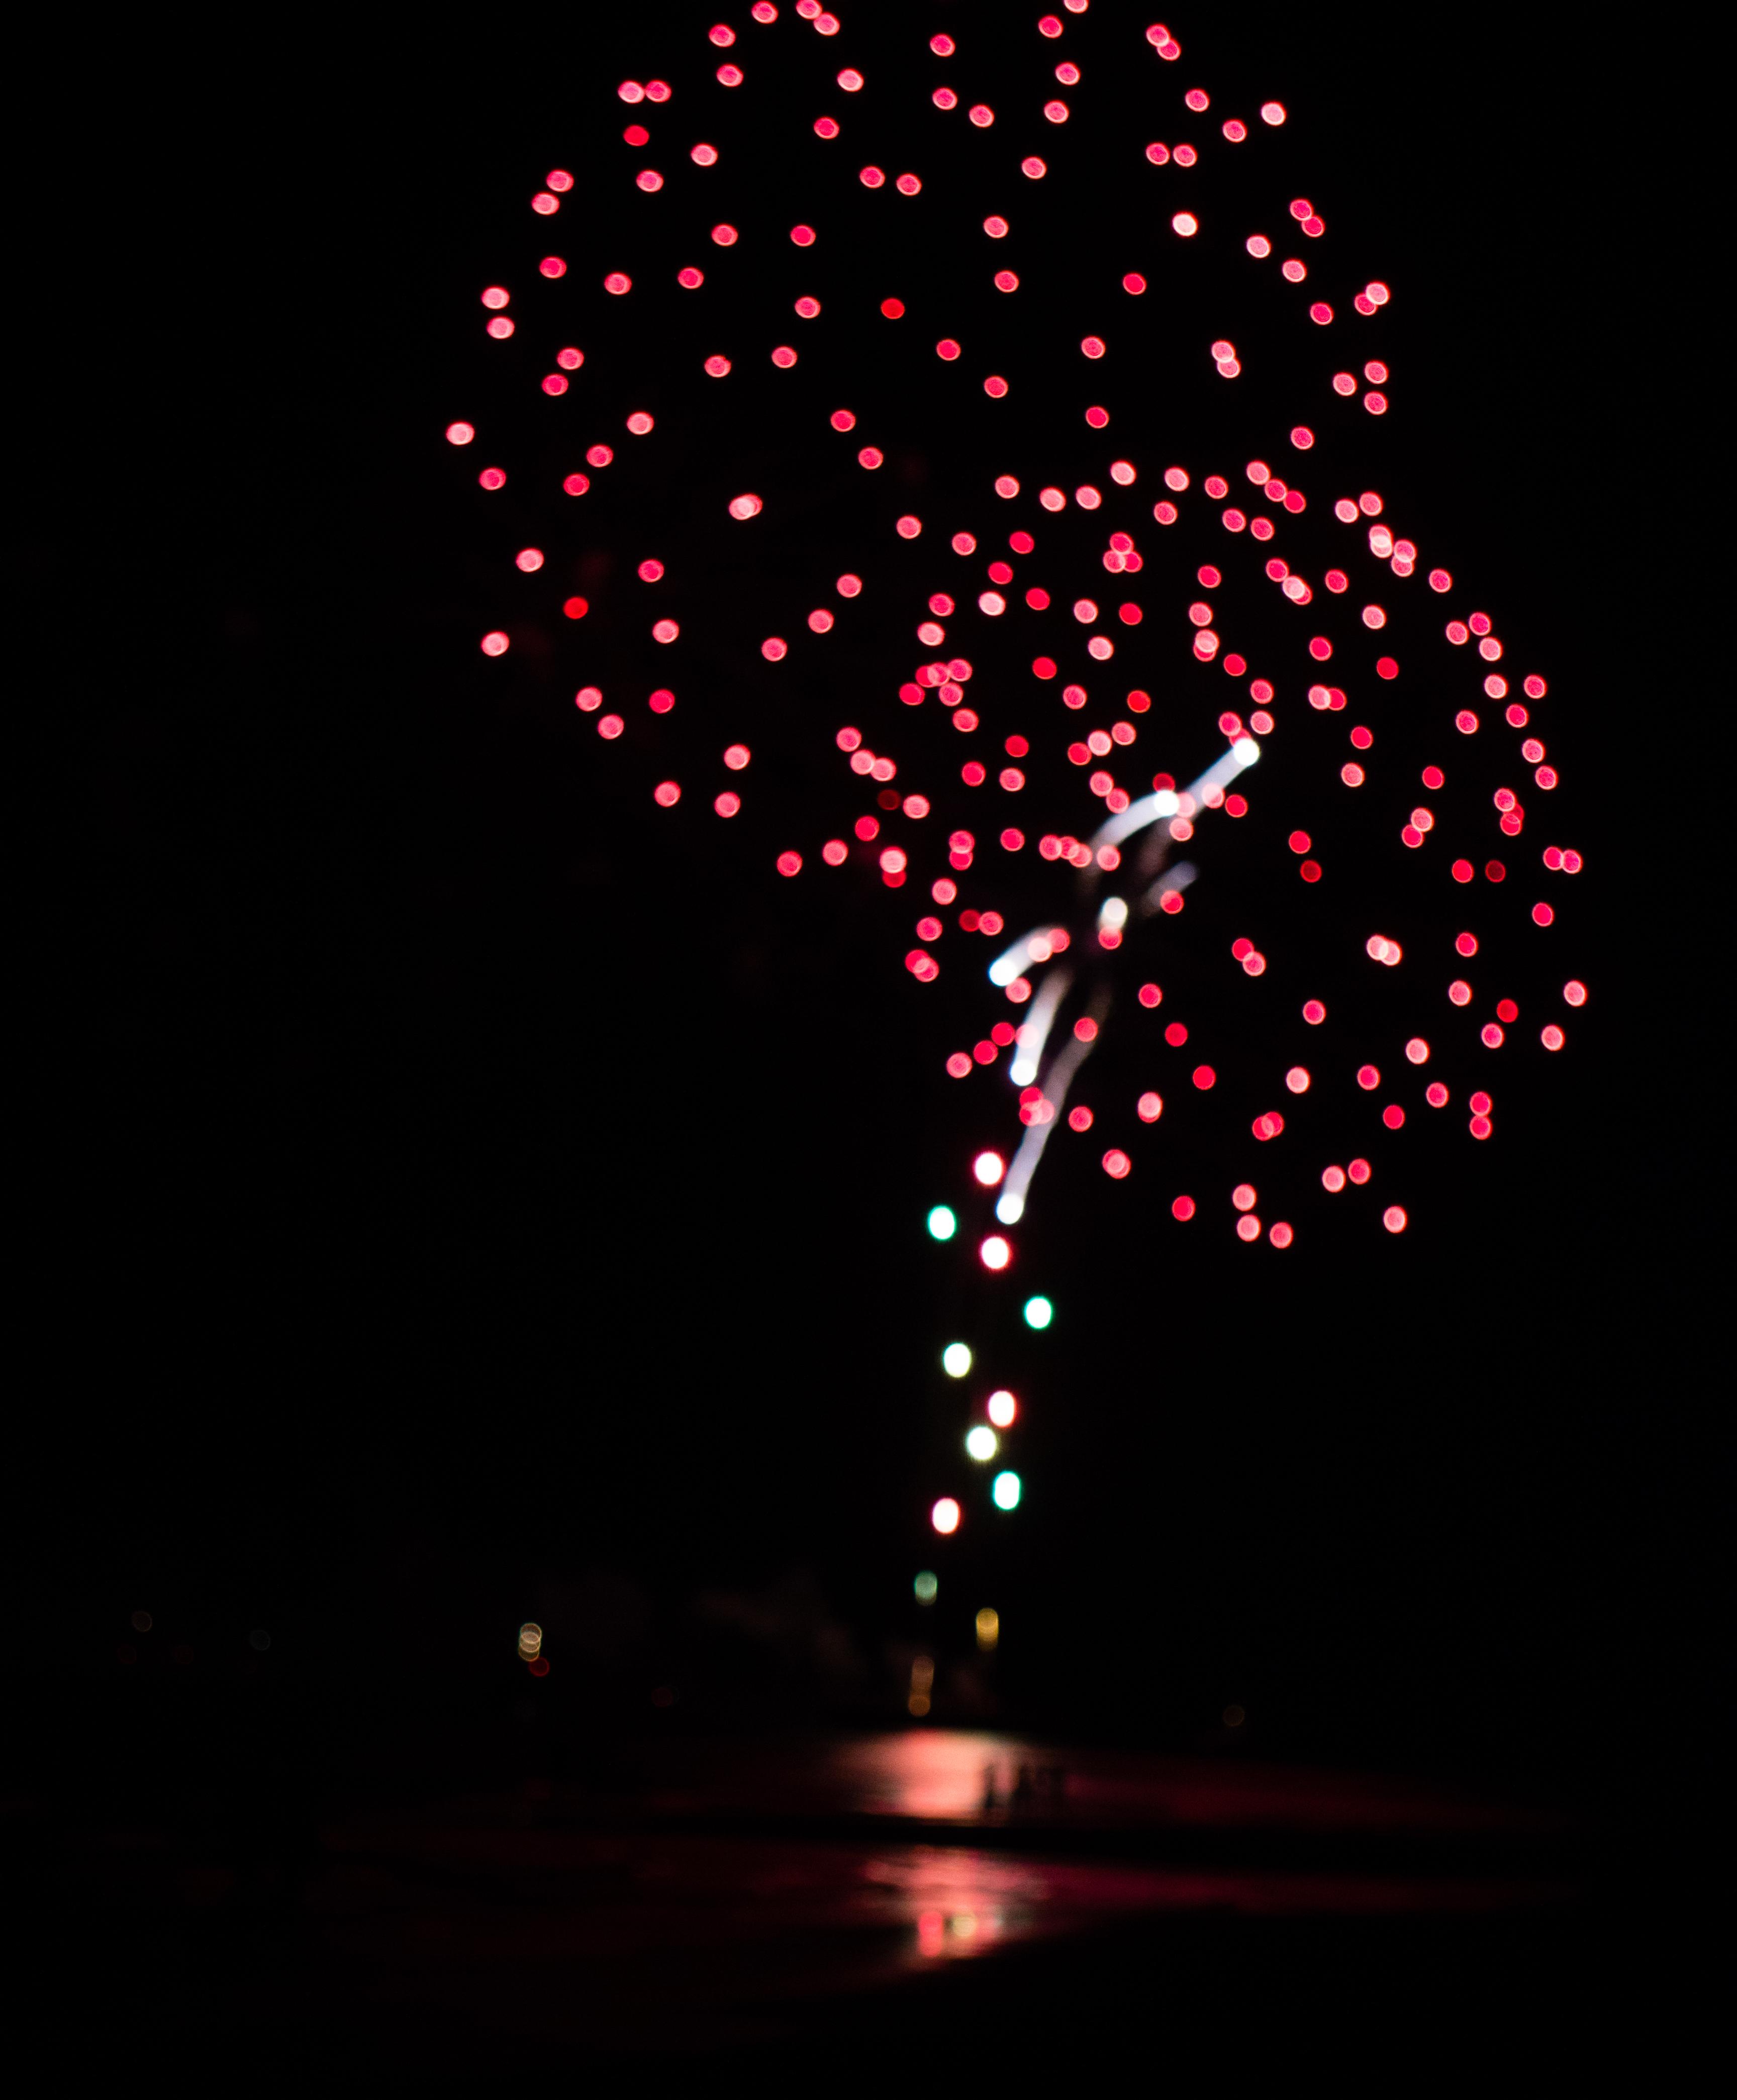 Holland Lights @ International Fireworks Festival, Beach, Lights, Shore, Sea, HQ Photo